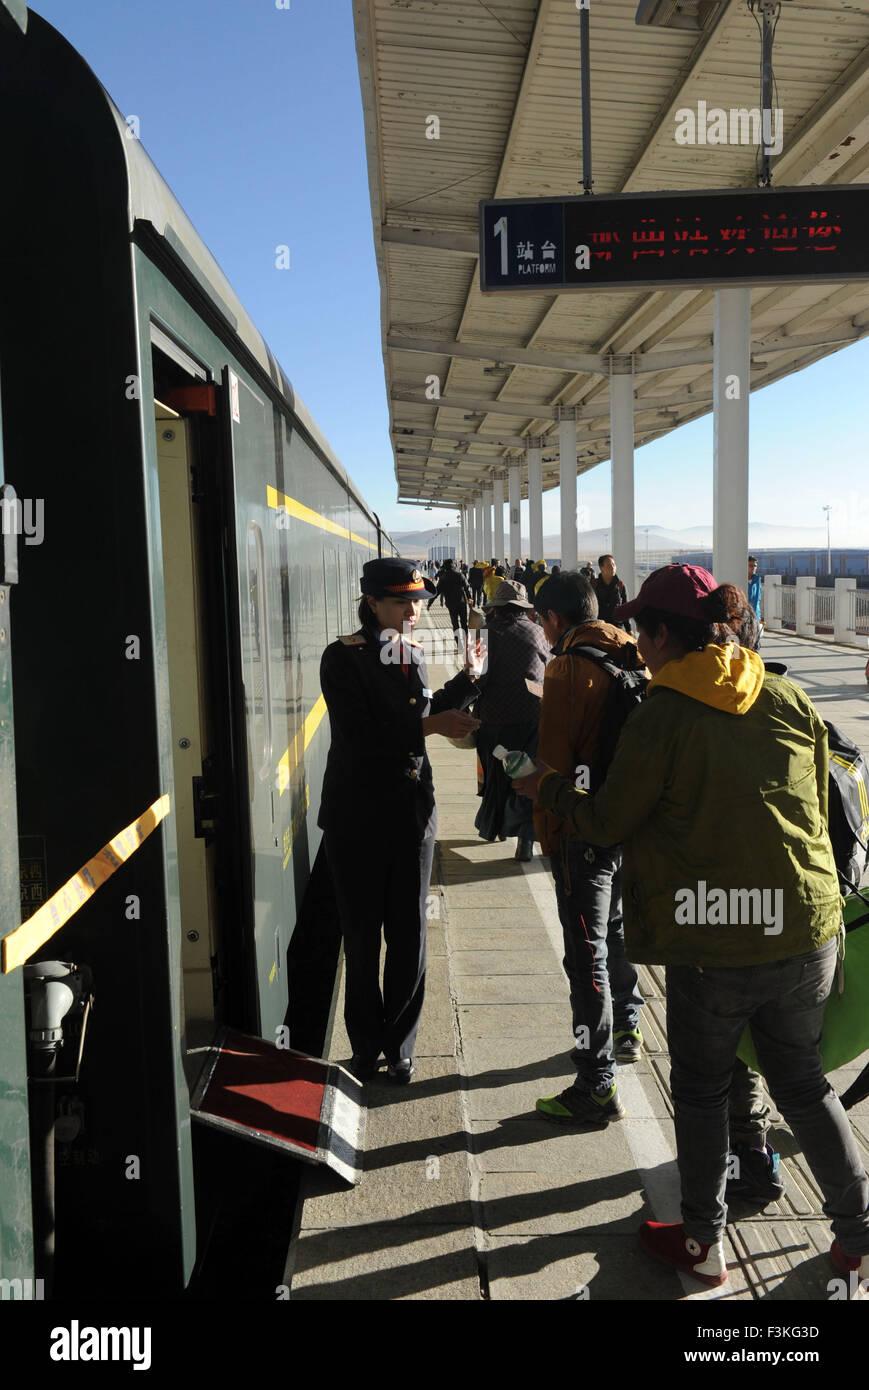 Lhasa, China's Tibet Autonomous Region. 7th Oct, 2015. Passengers board the Beijing-Lhasa train Z21 at the Naqu - Stock Image